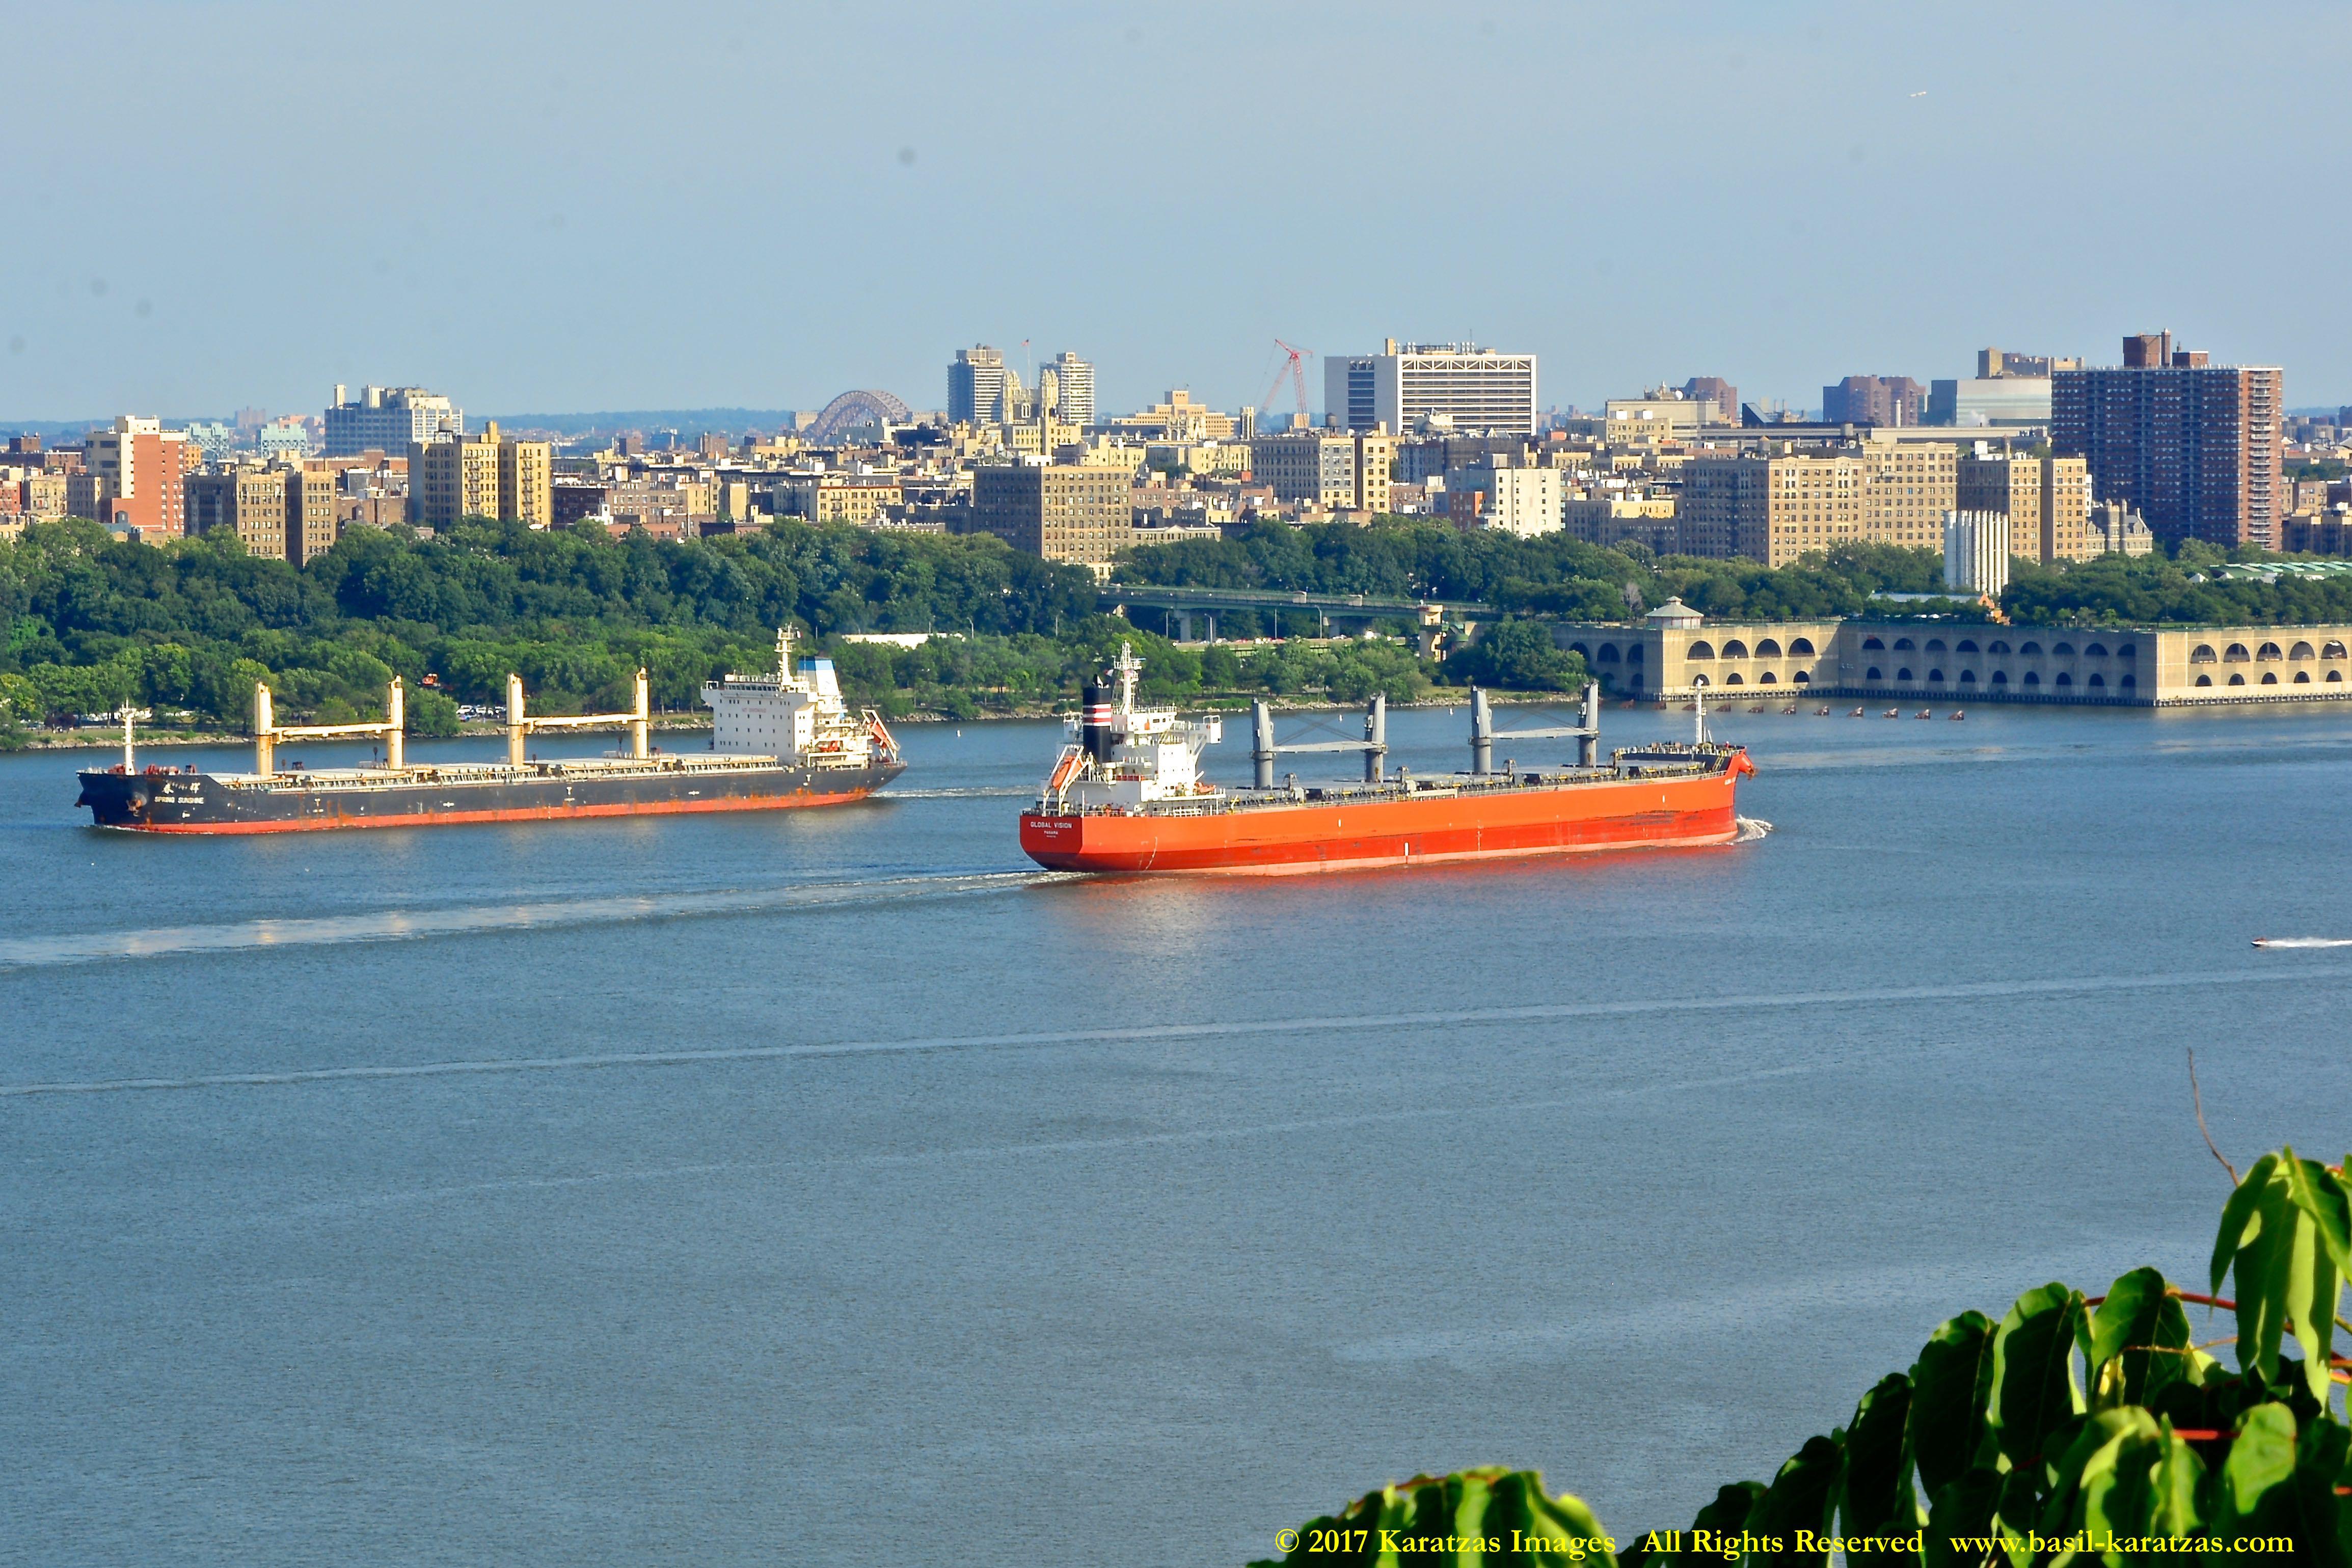 NYK Line | Karatzas Photographie Maritime